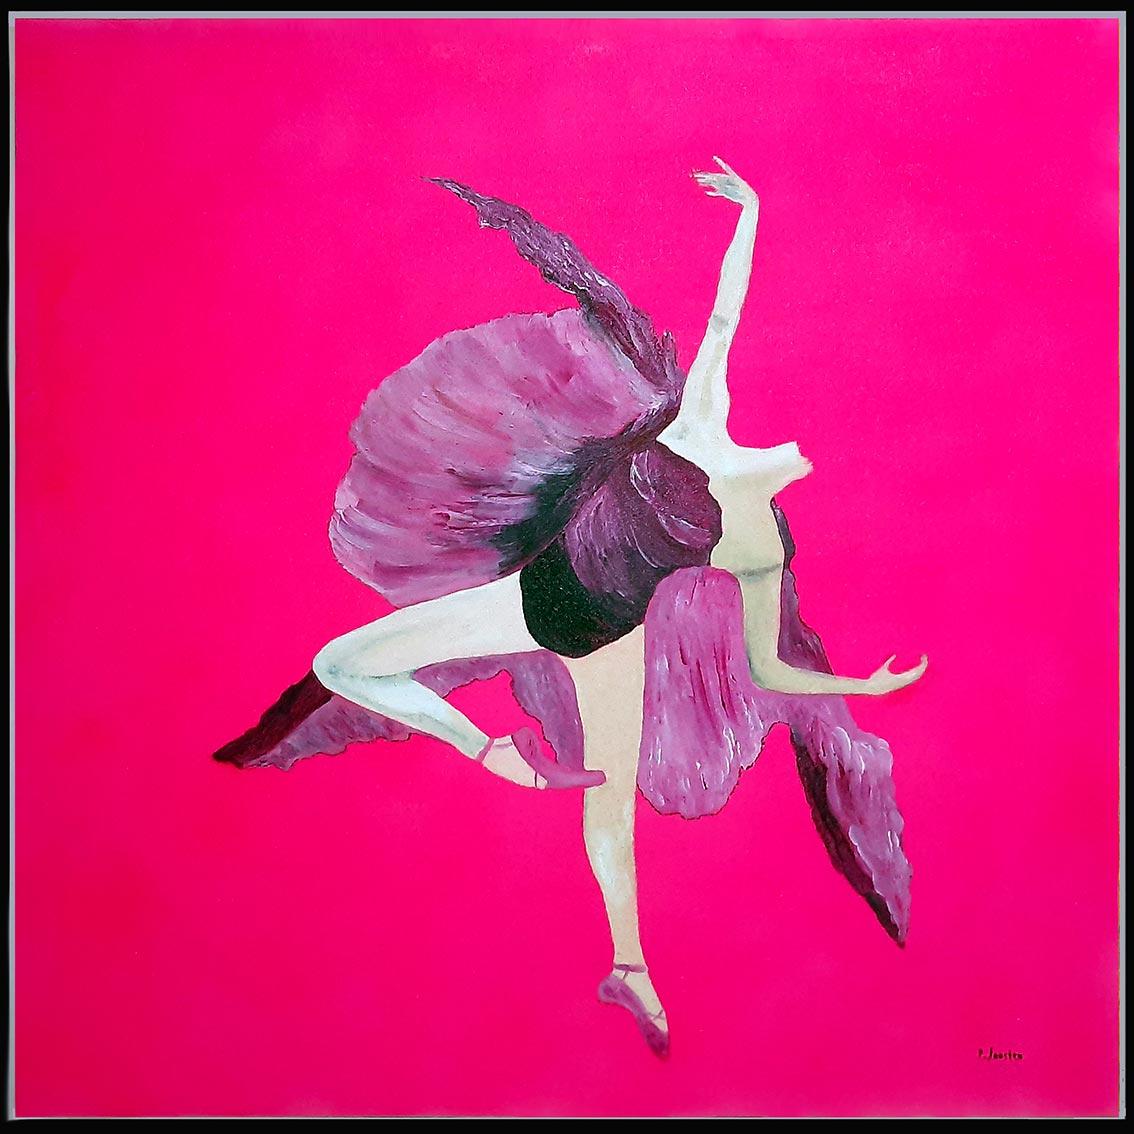 Body-Dancer-Patrick-Joosten-2020-December-08th-With-frame